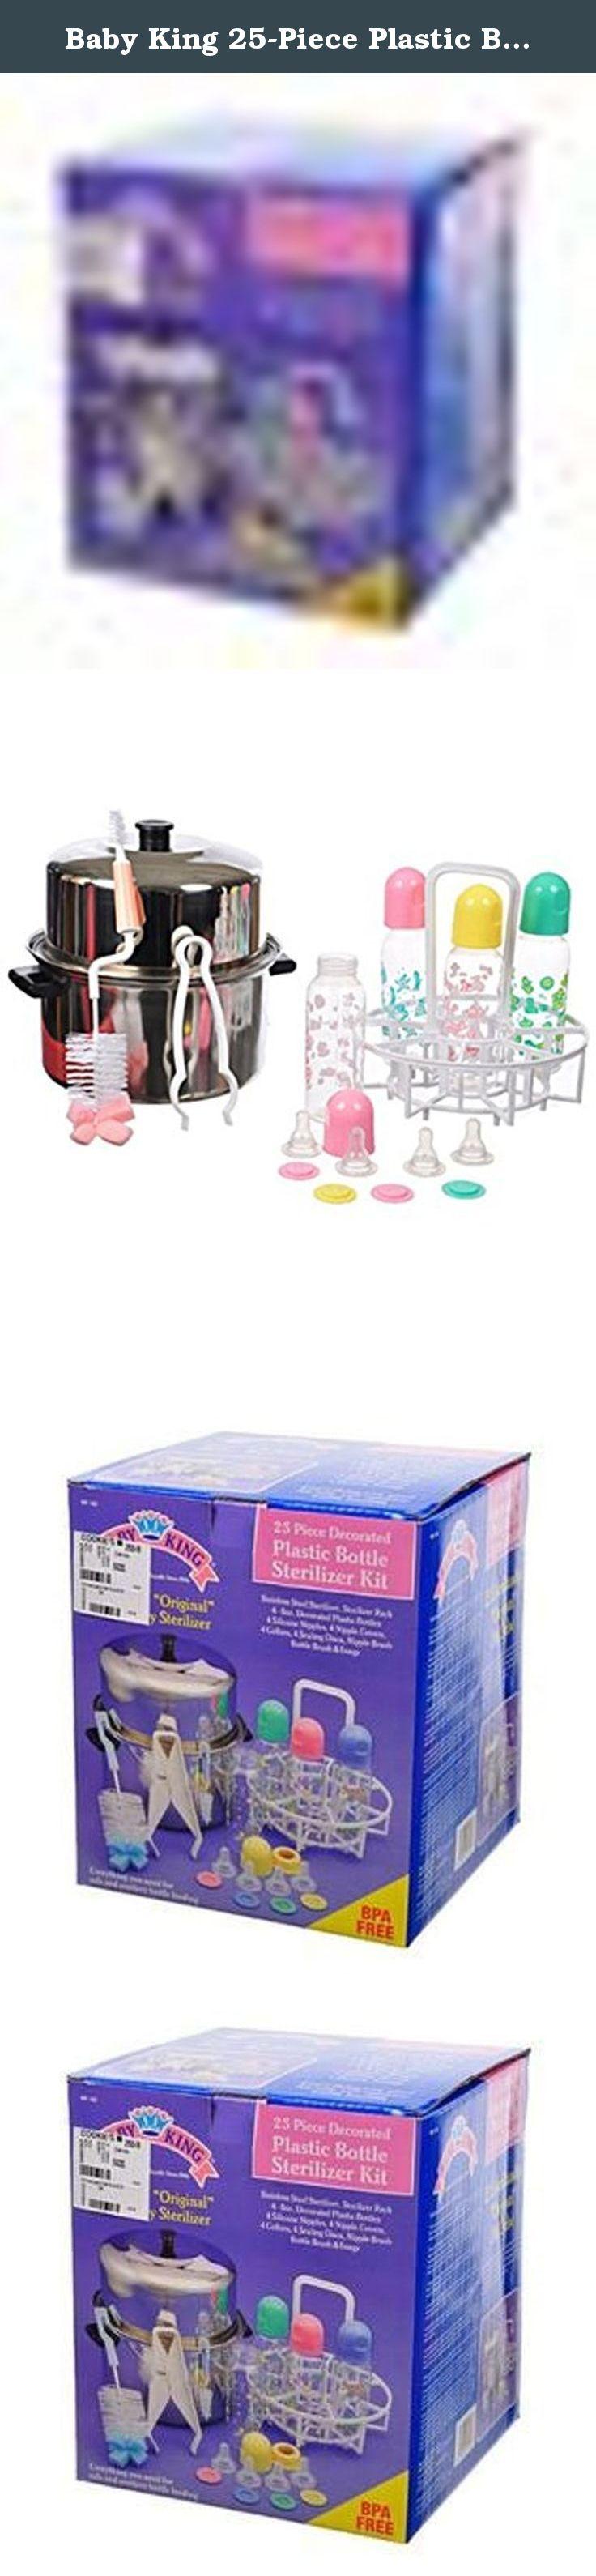 Baby King 25-Piece Plastic Bottle Sterilizer Kit